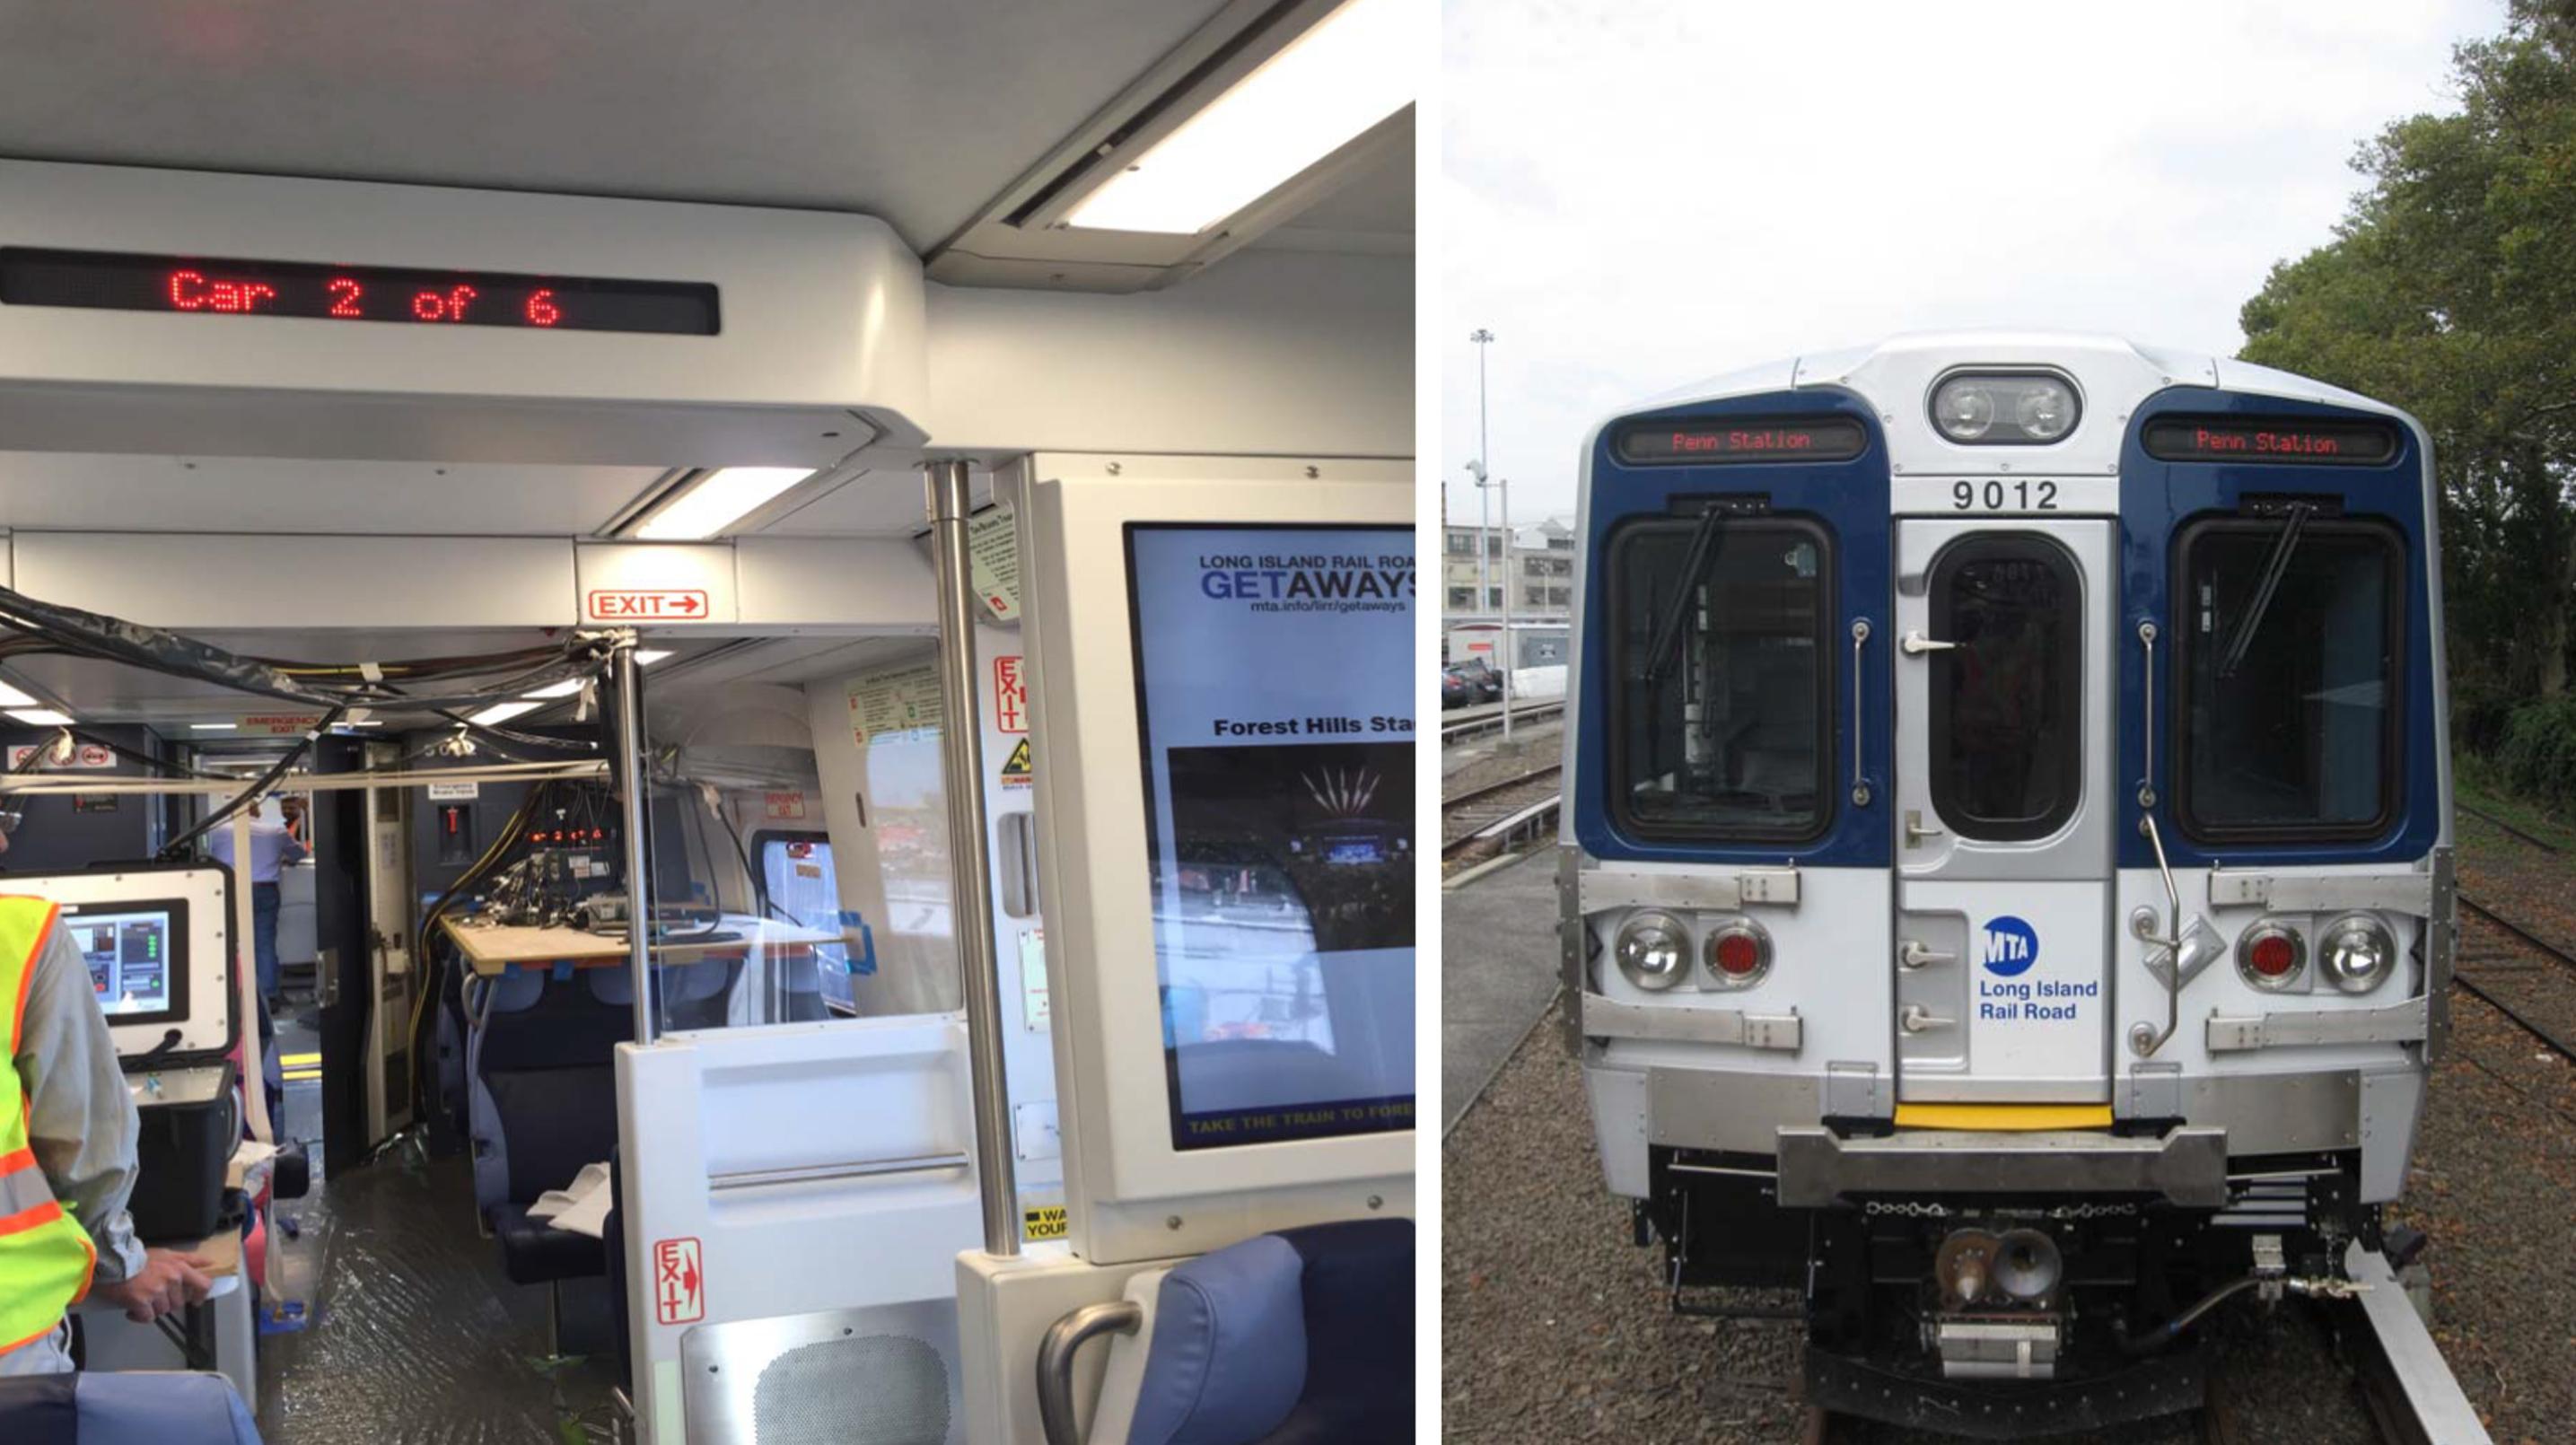 New M9 Rail Car Destination Signs